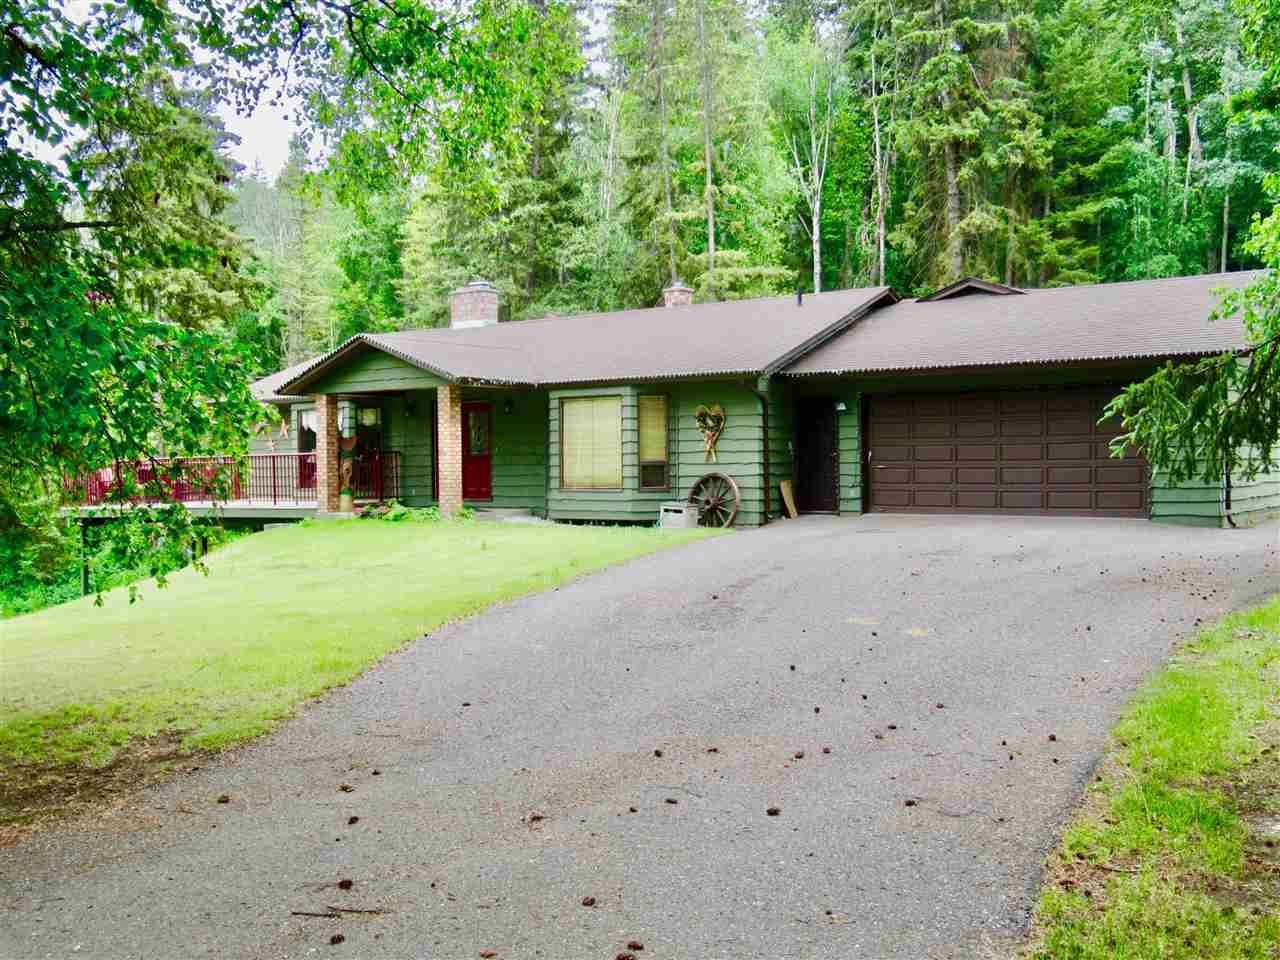 Photo 1: Photos: 911 CENTAUR Drive in Williams Lake: Esler/Dog Creek House for sale (Williams Lake (Zone 27))  : MLS®# R2378444